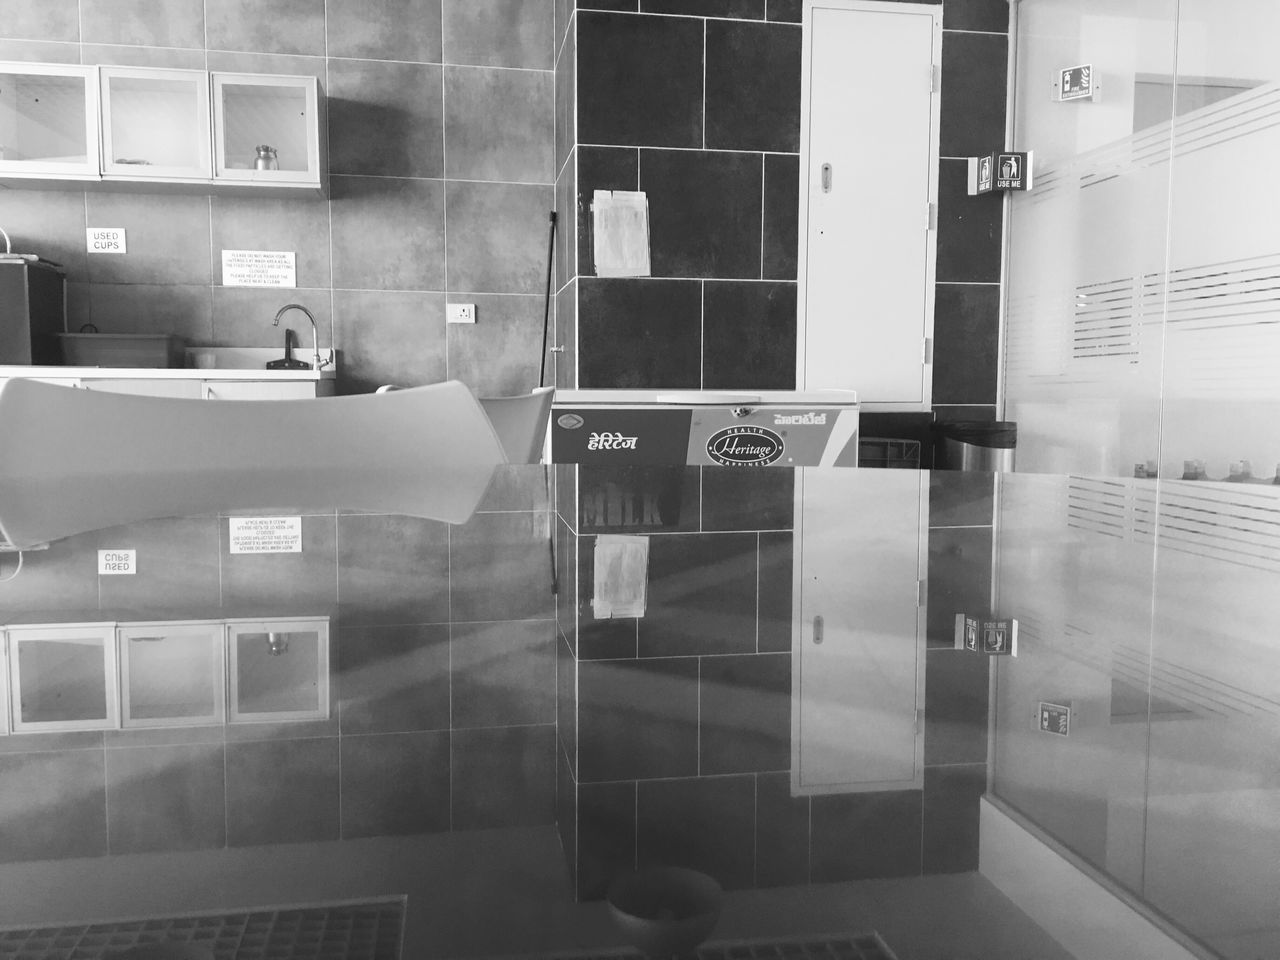 Reflection Black And White Monochrome Photography Glasses Reflect Indoors  No People Illuminated